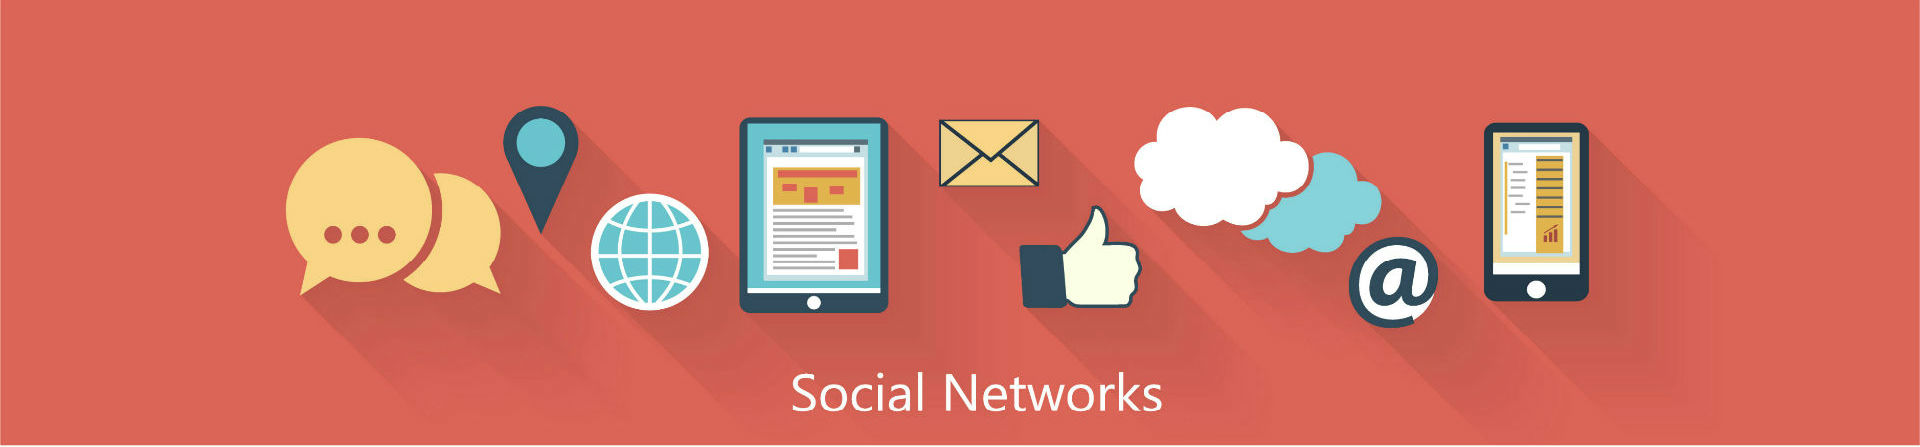 BIGTIME-Marketing-Social-Media-Marketing-Portland-(OR)